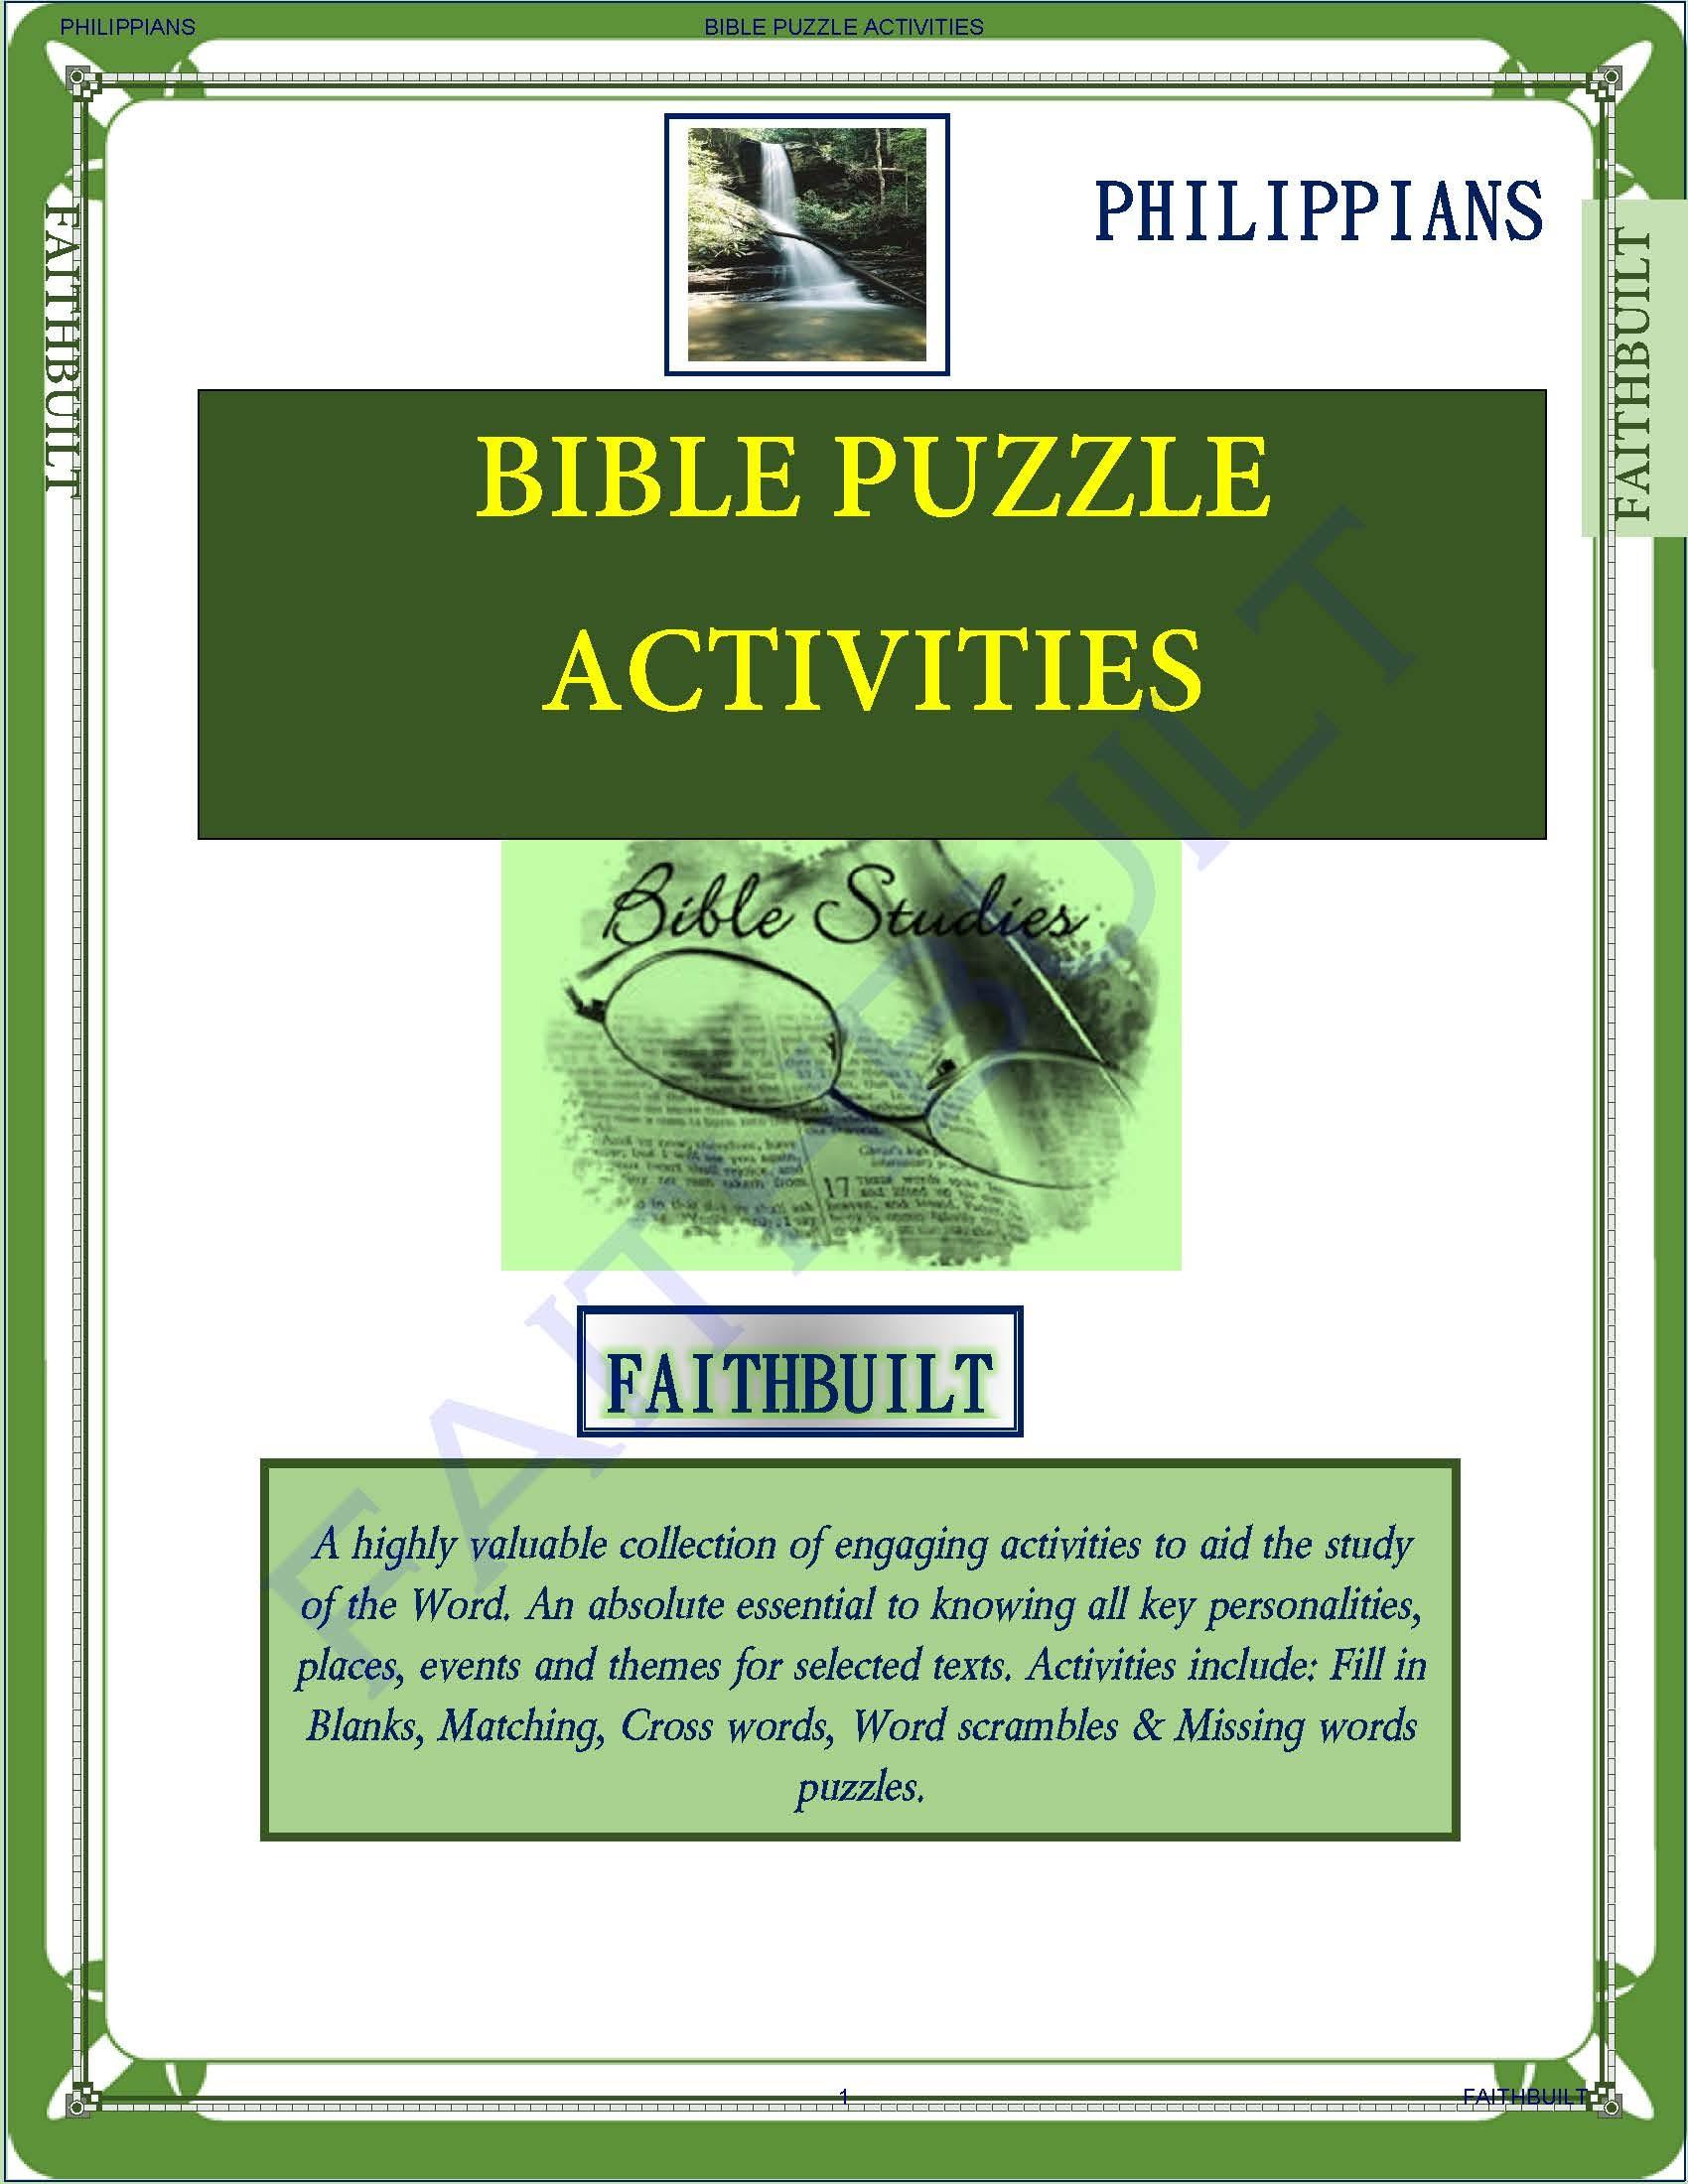 PHILIPPIANS : BIBLE PUZZLES & ACTIVITIES